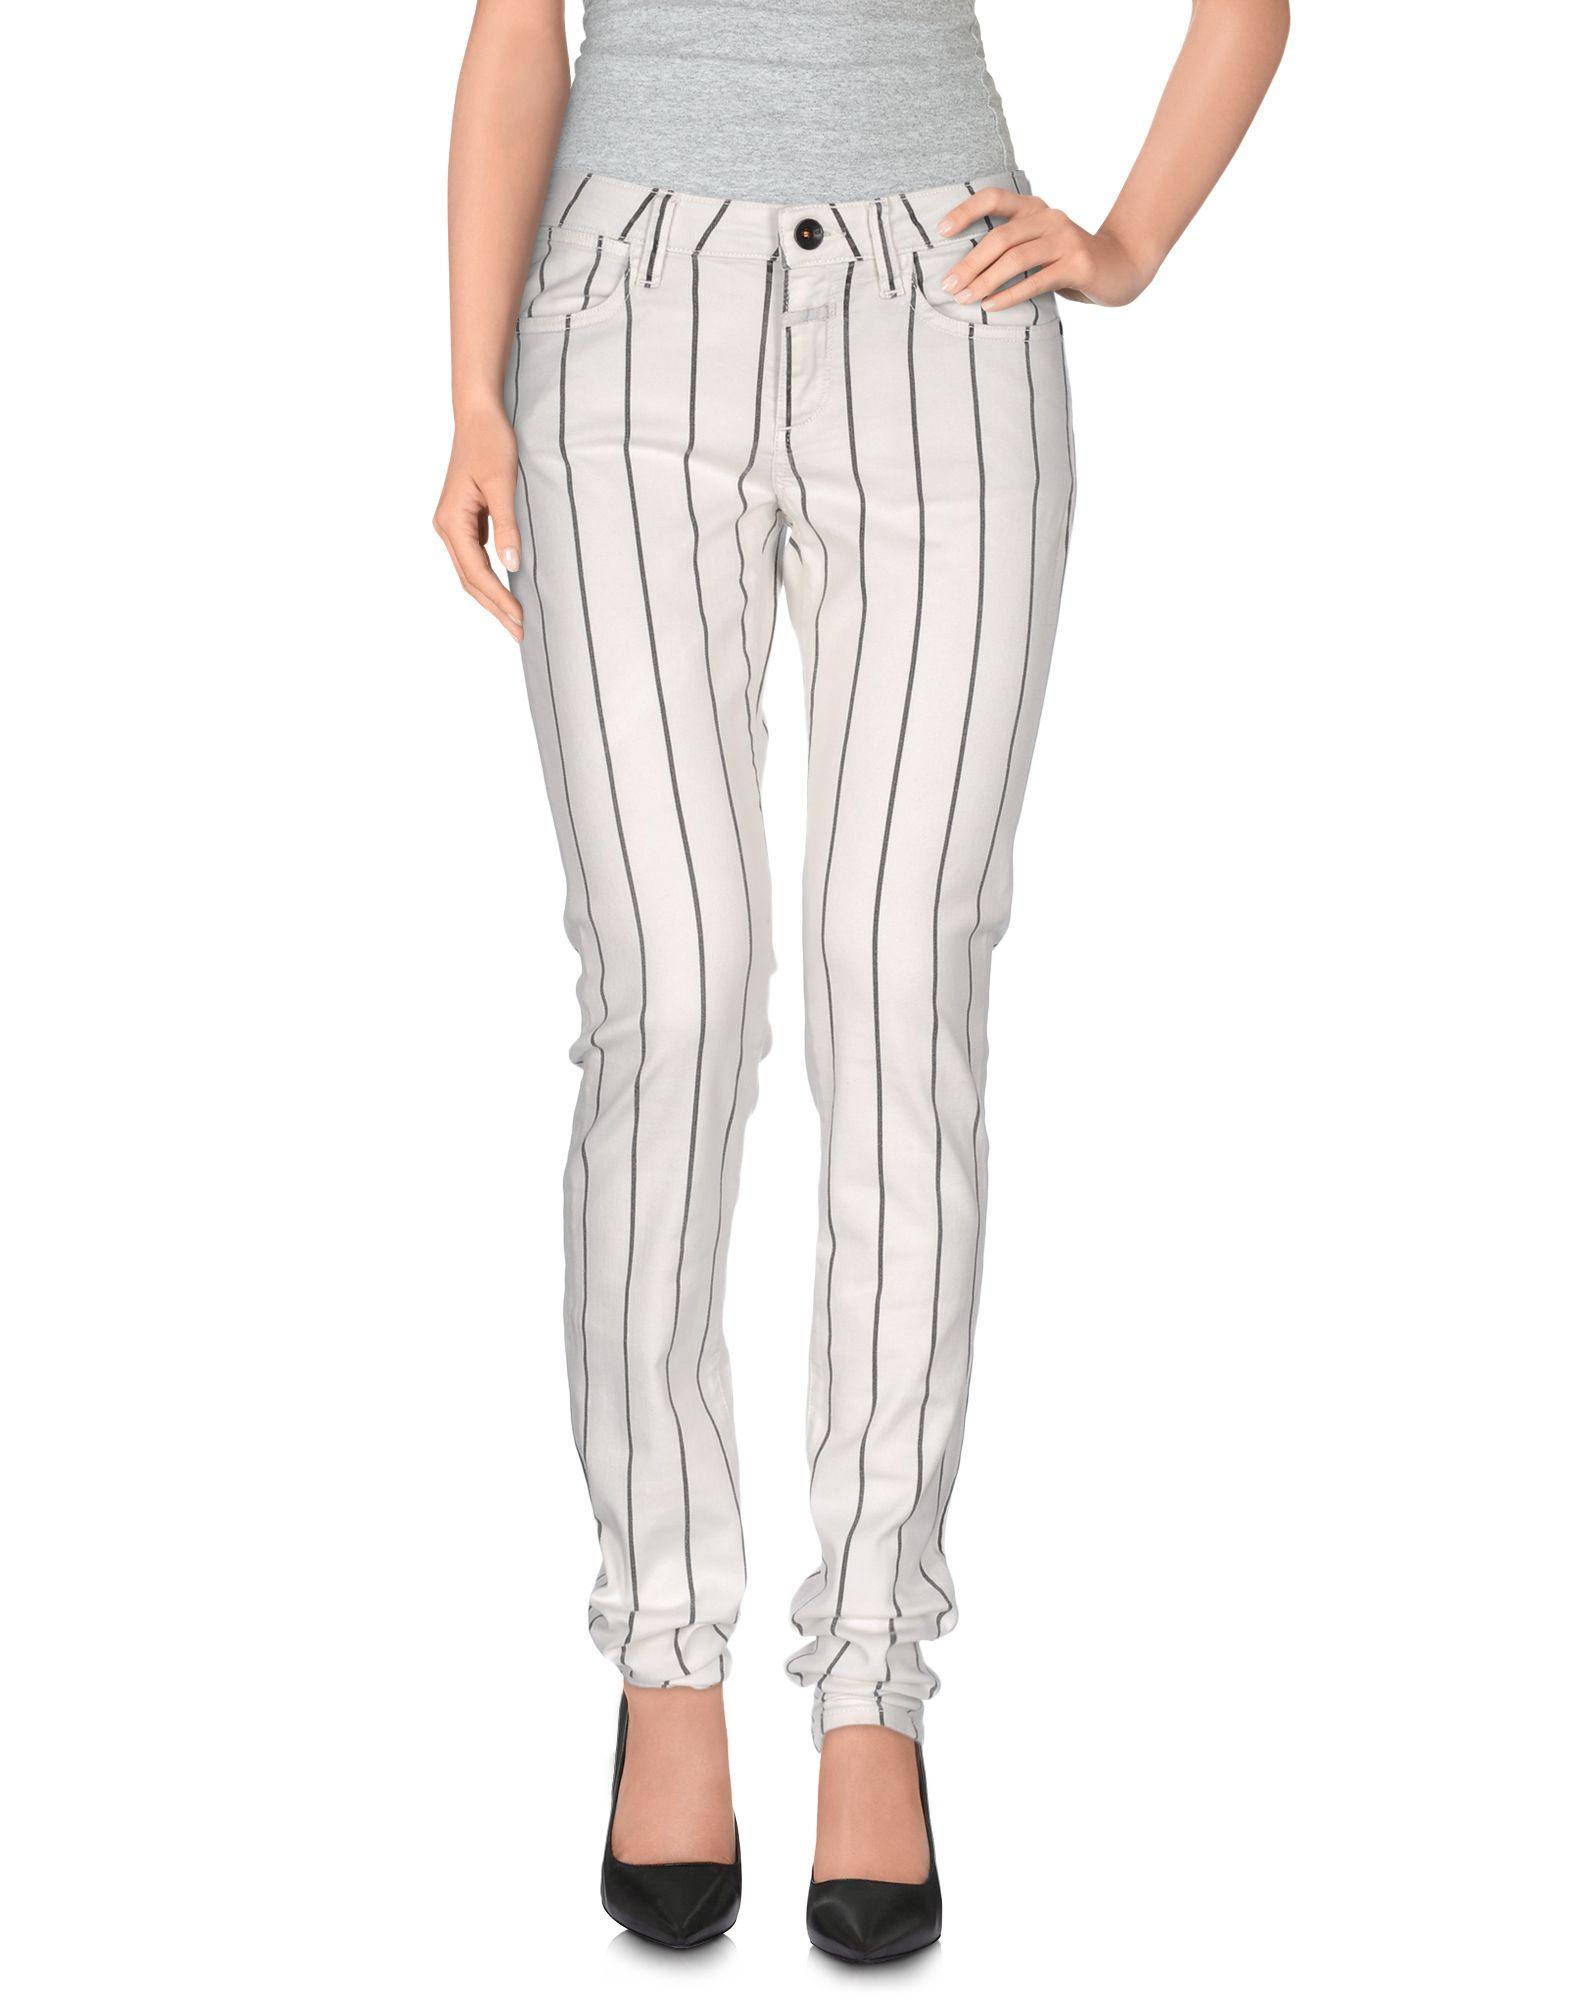 CLOSED Damen Hose Farbe Weiß Größe 4